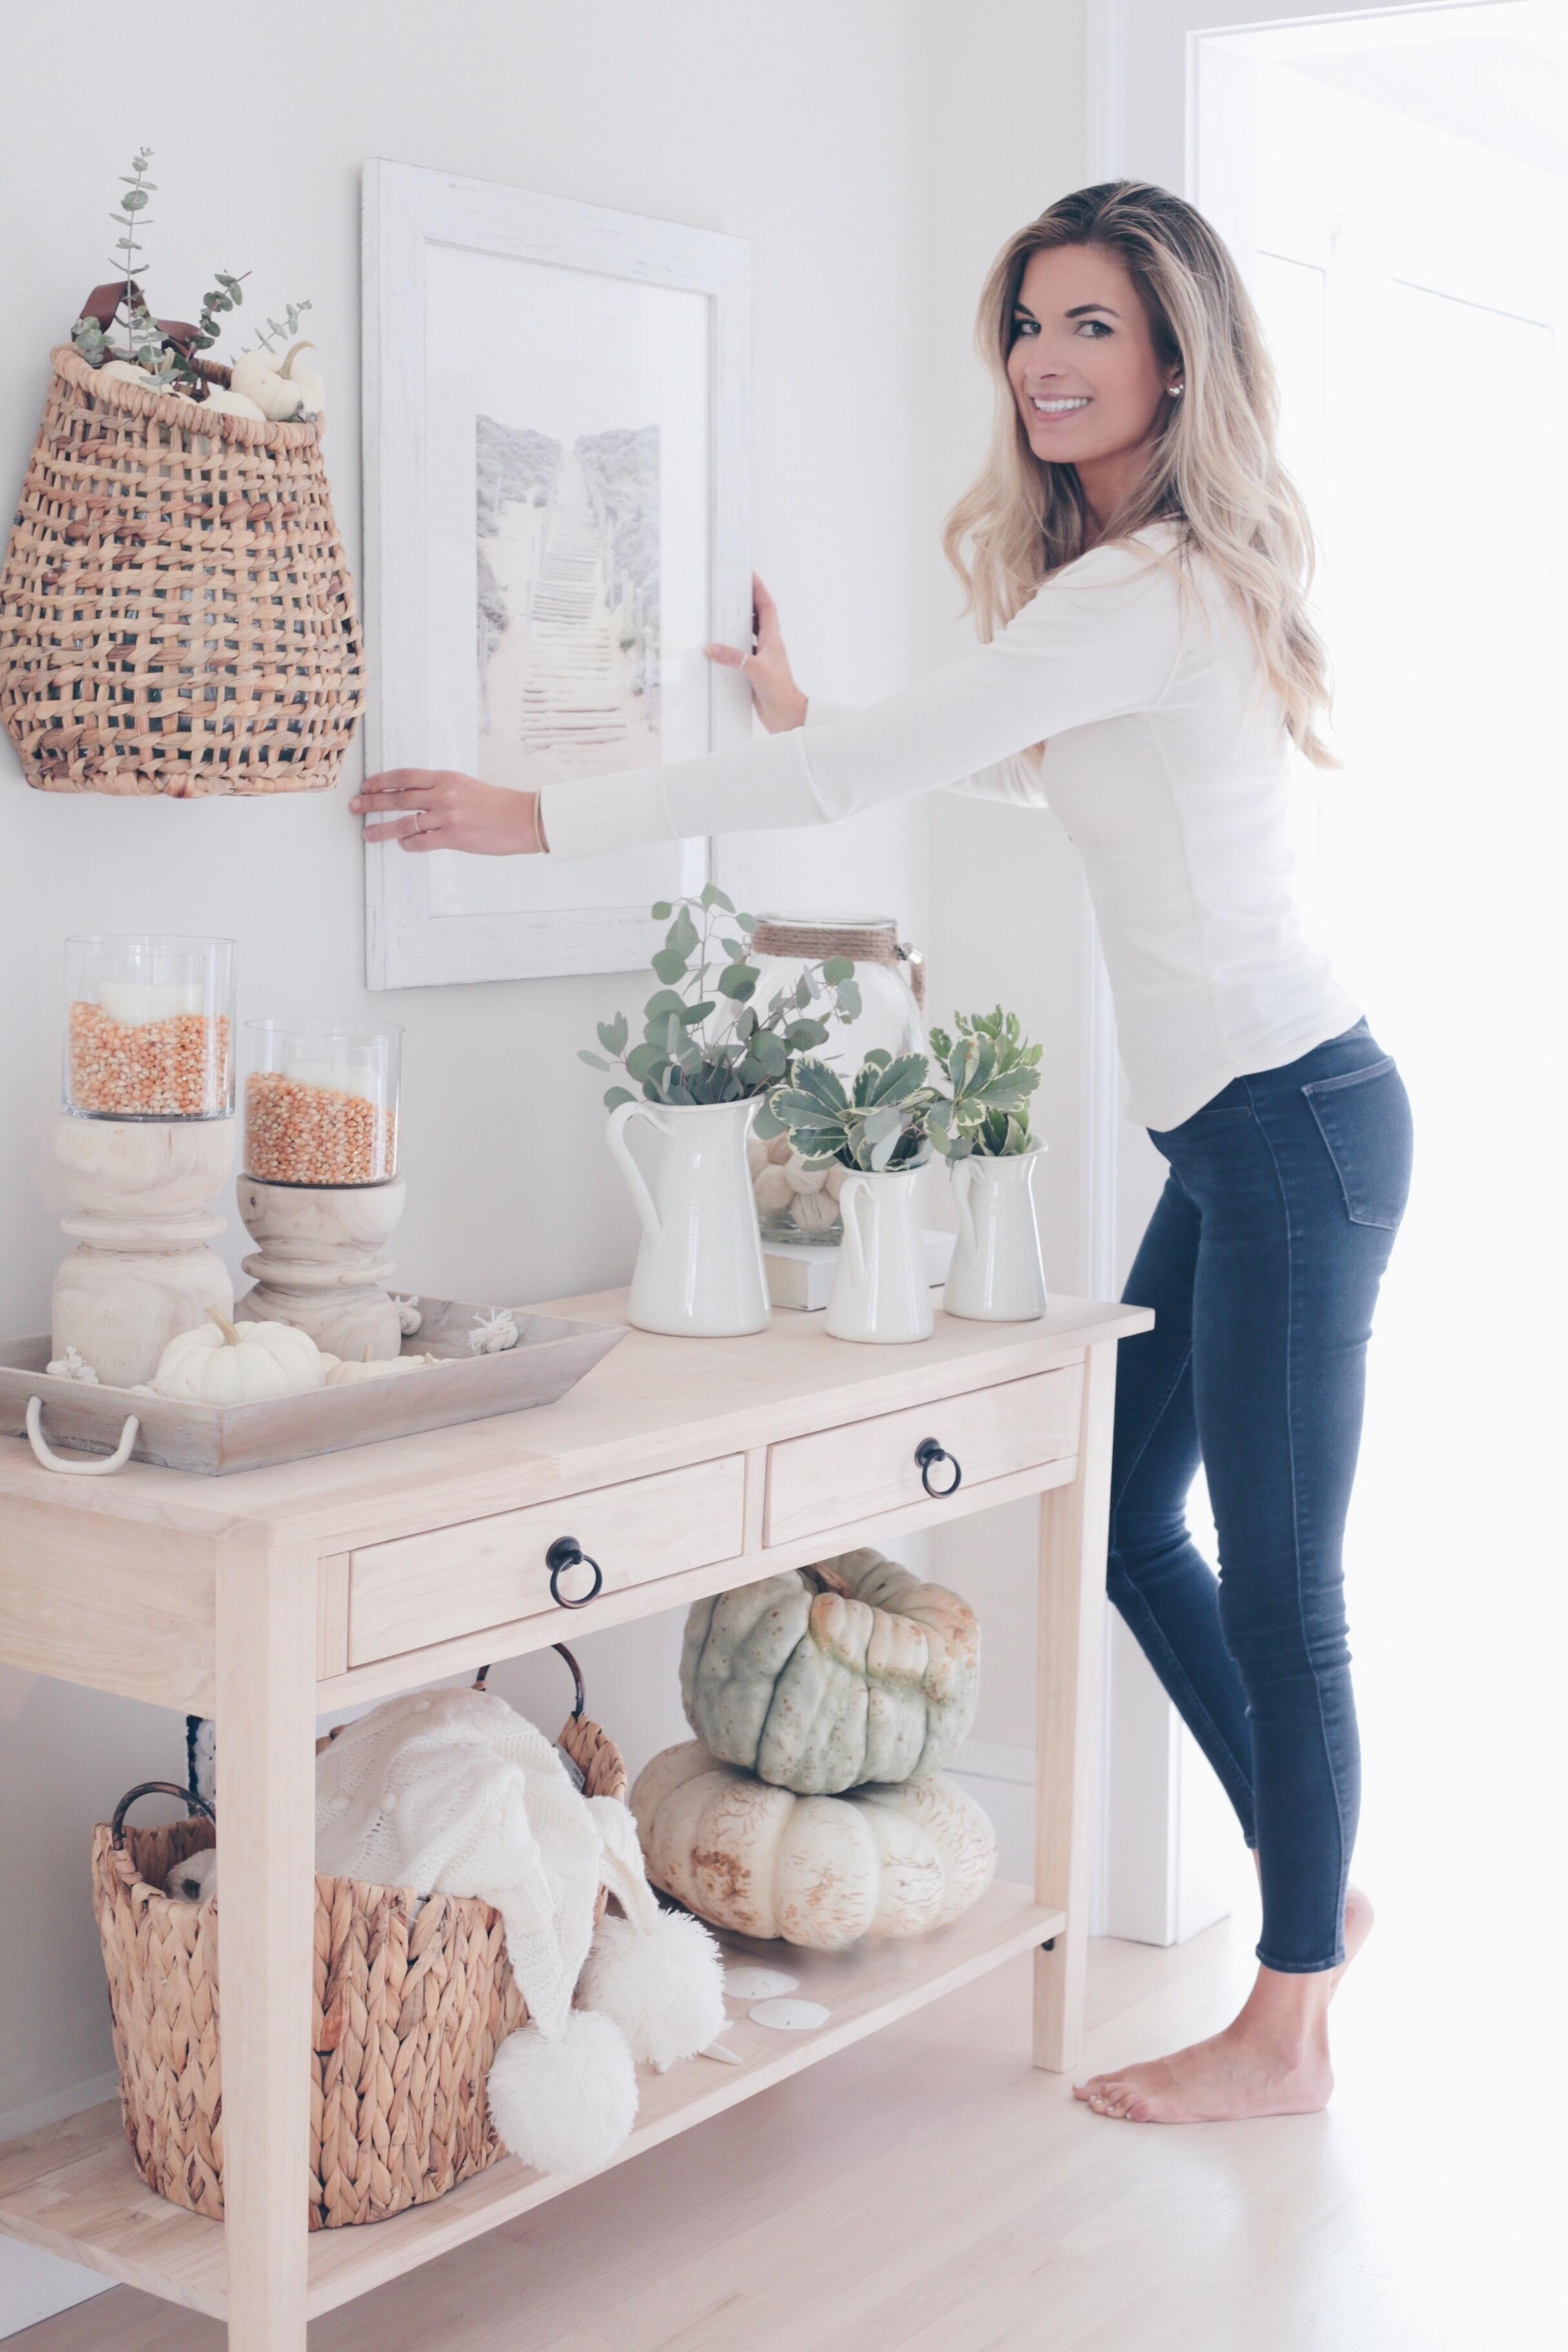 rachel moore of pinteresting plans lifestyle blog sharing favorite Fall home decor 2018